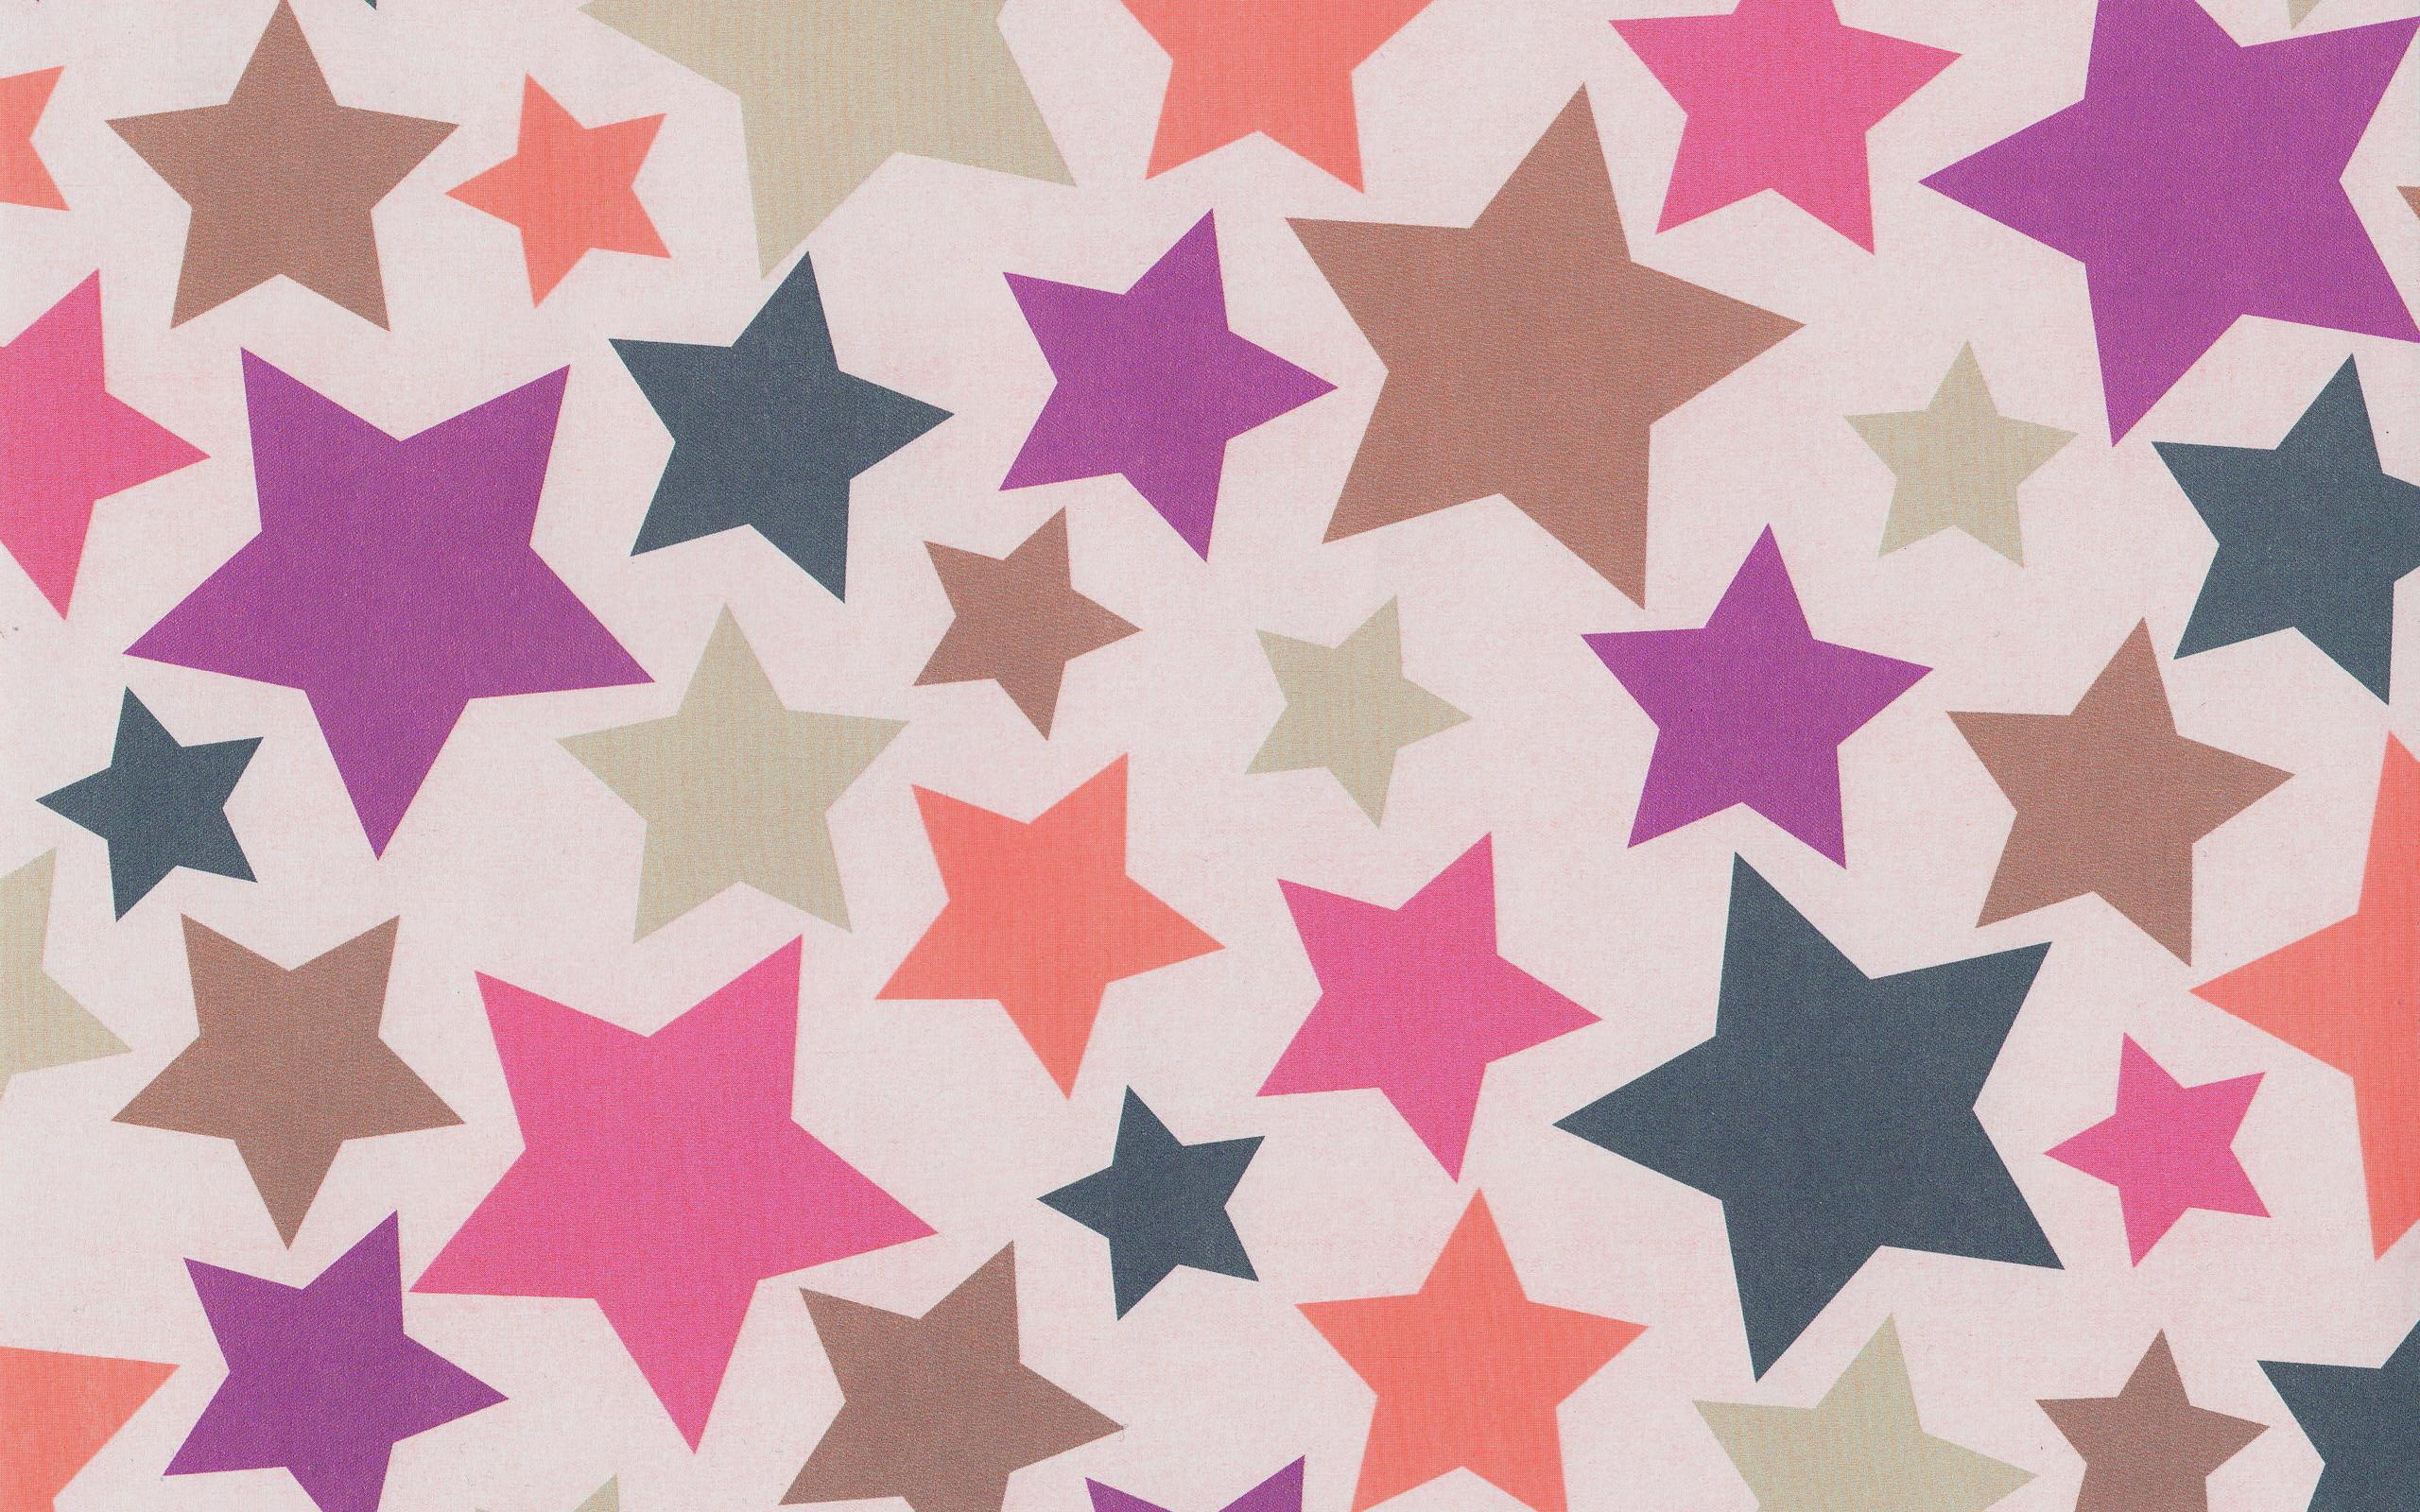 Colorful stars art